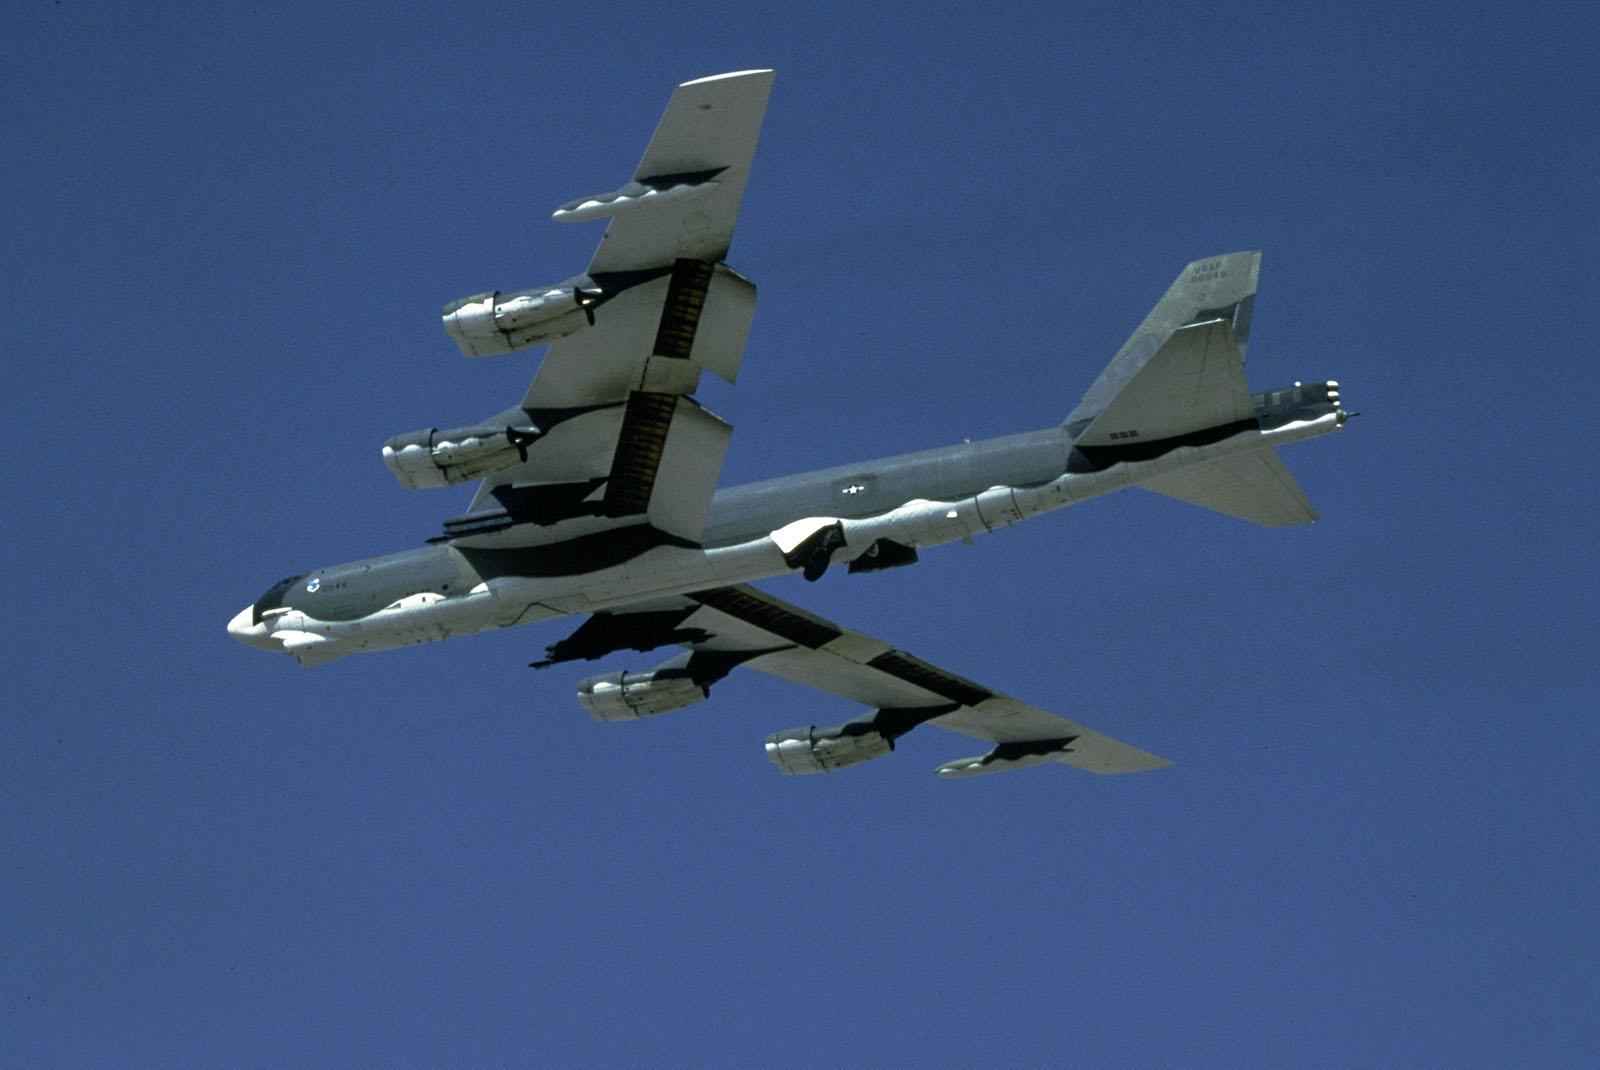 Boeing B-52H Stratofortress Photo Gallery